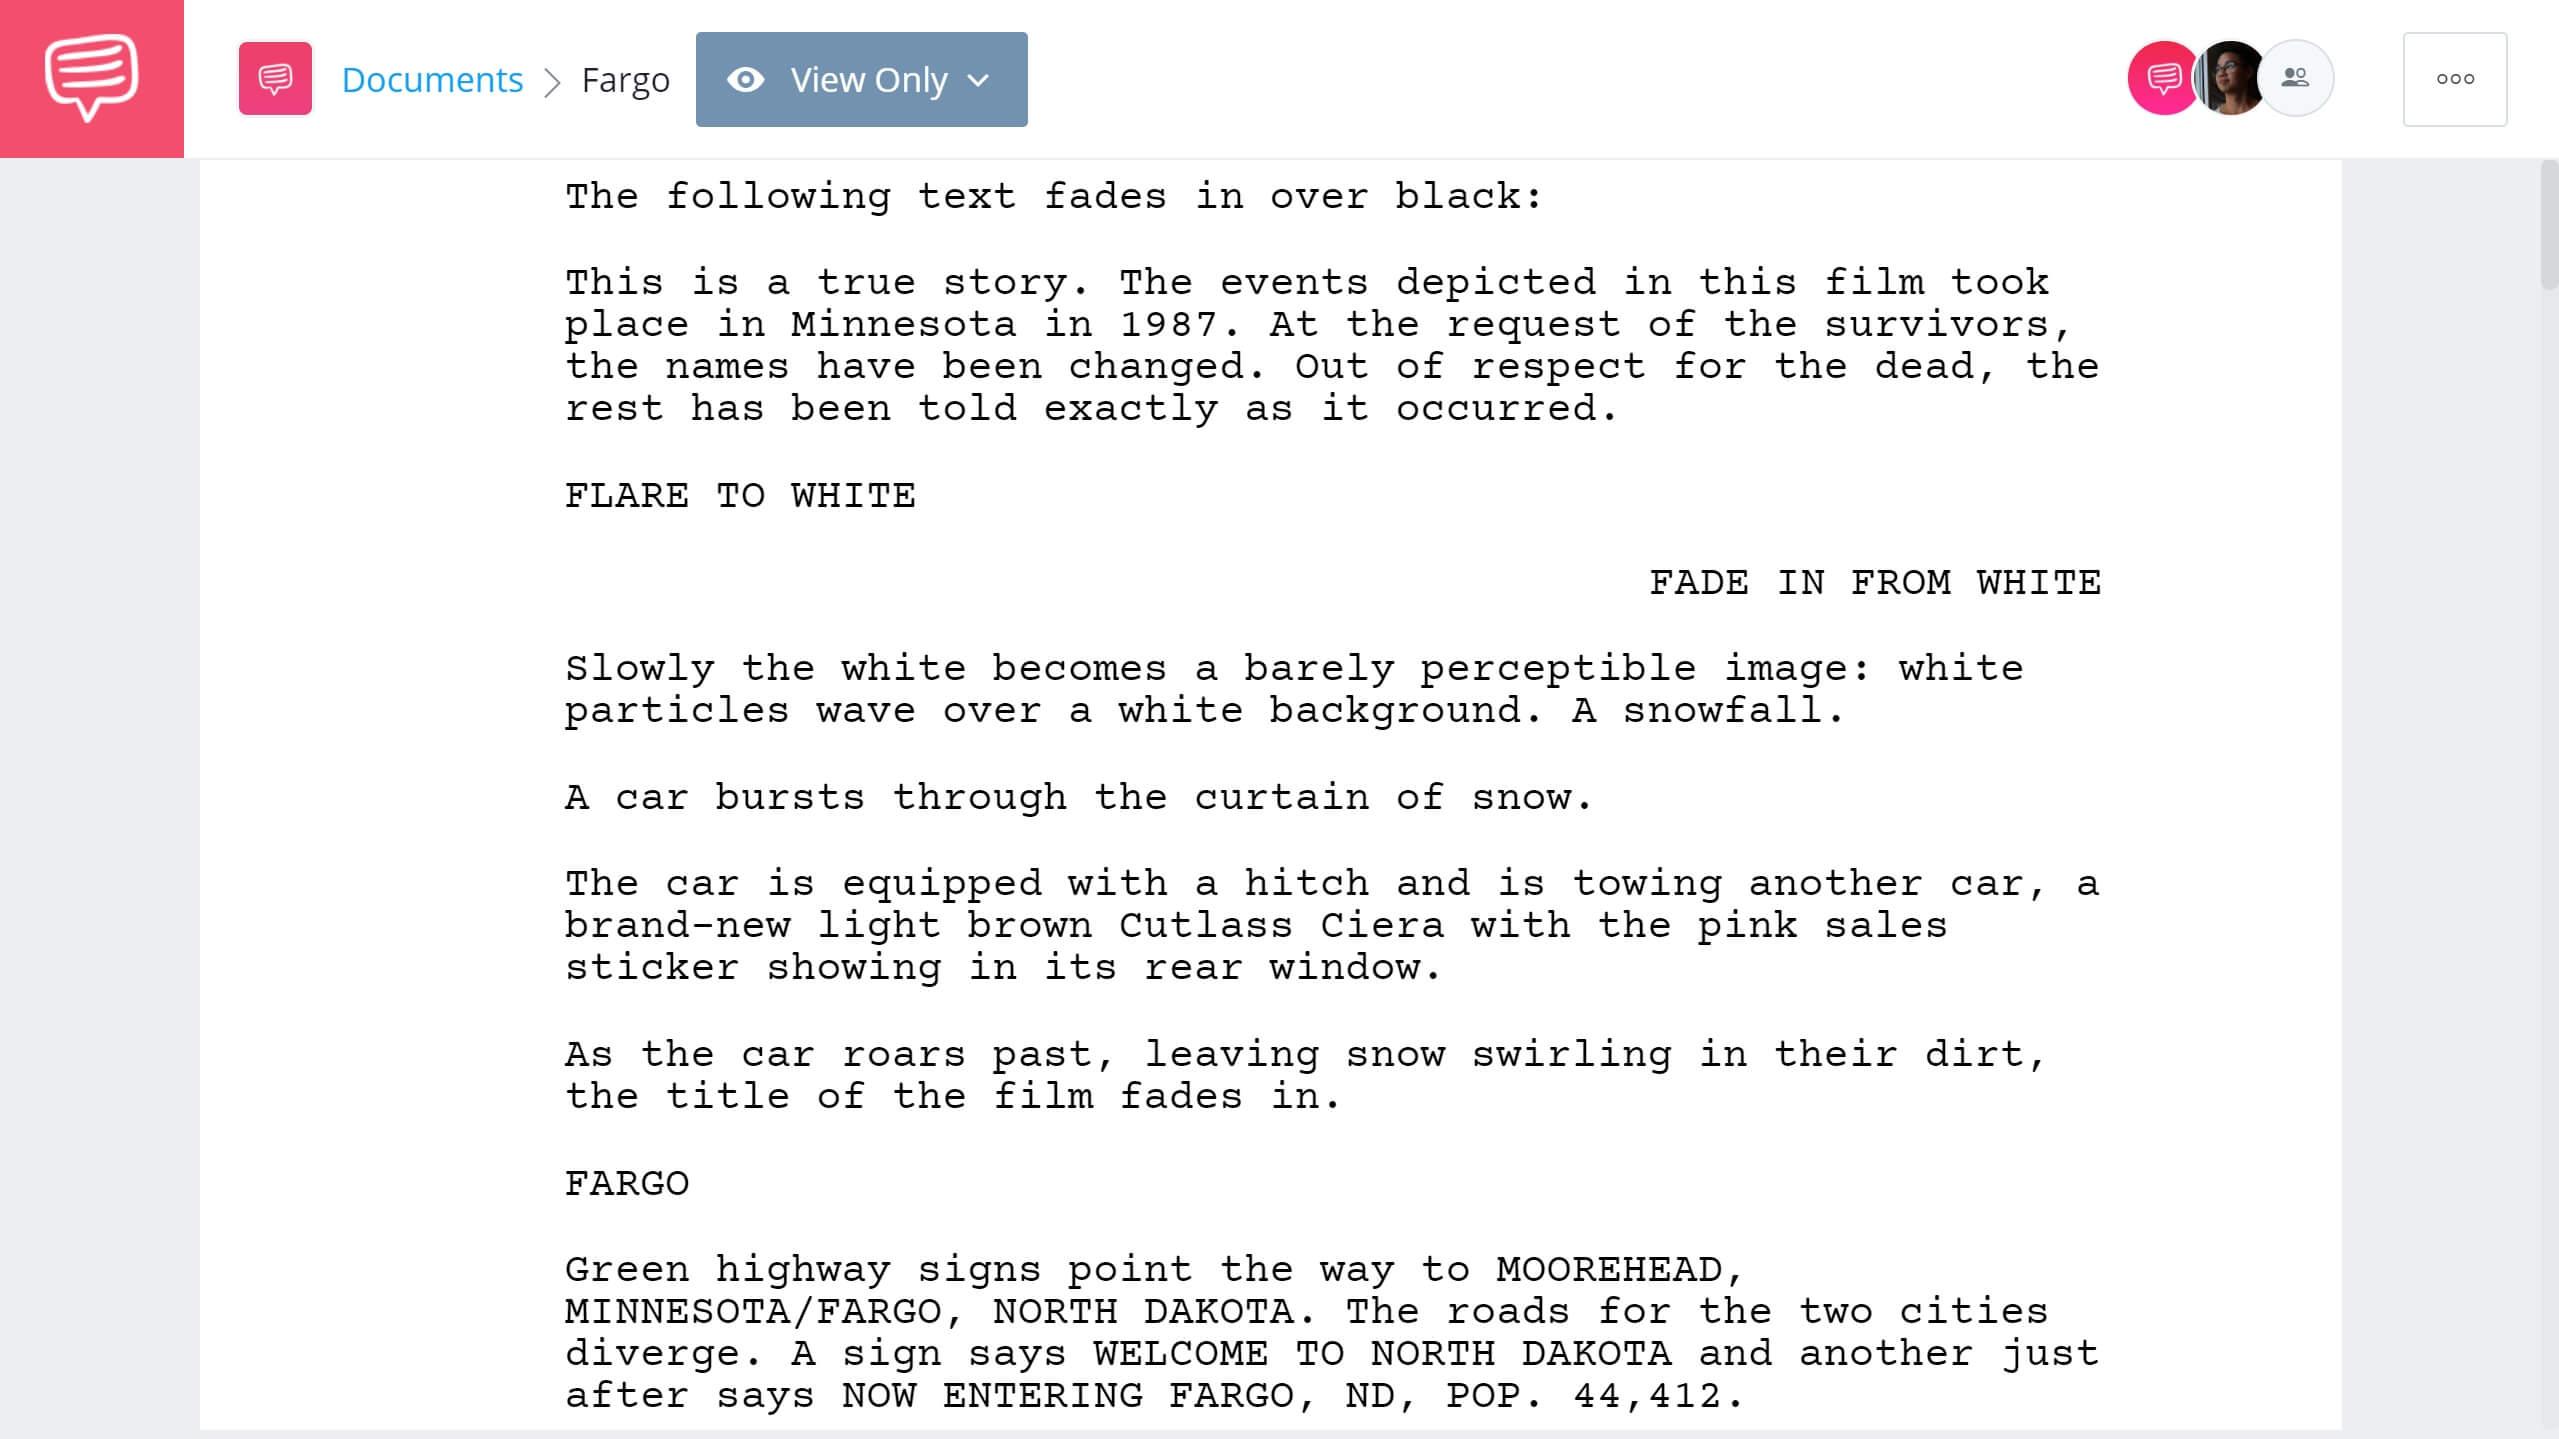 Best Original Screenplay Academy Award - Fargo Full Script PDF Download - StudioBinder Screenwriting Software